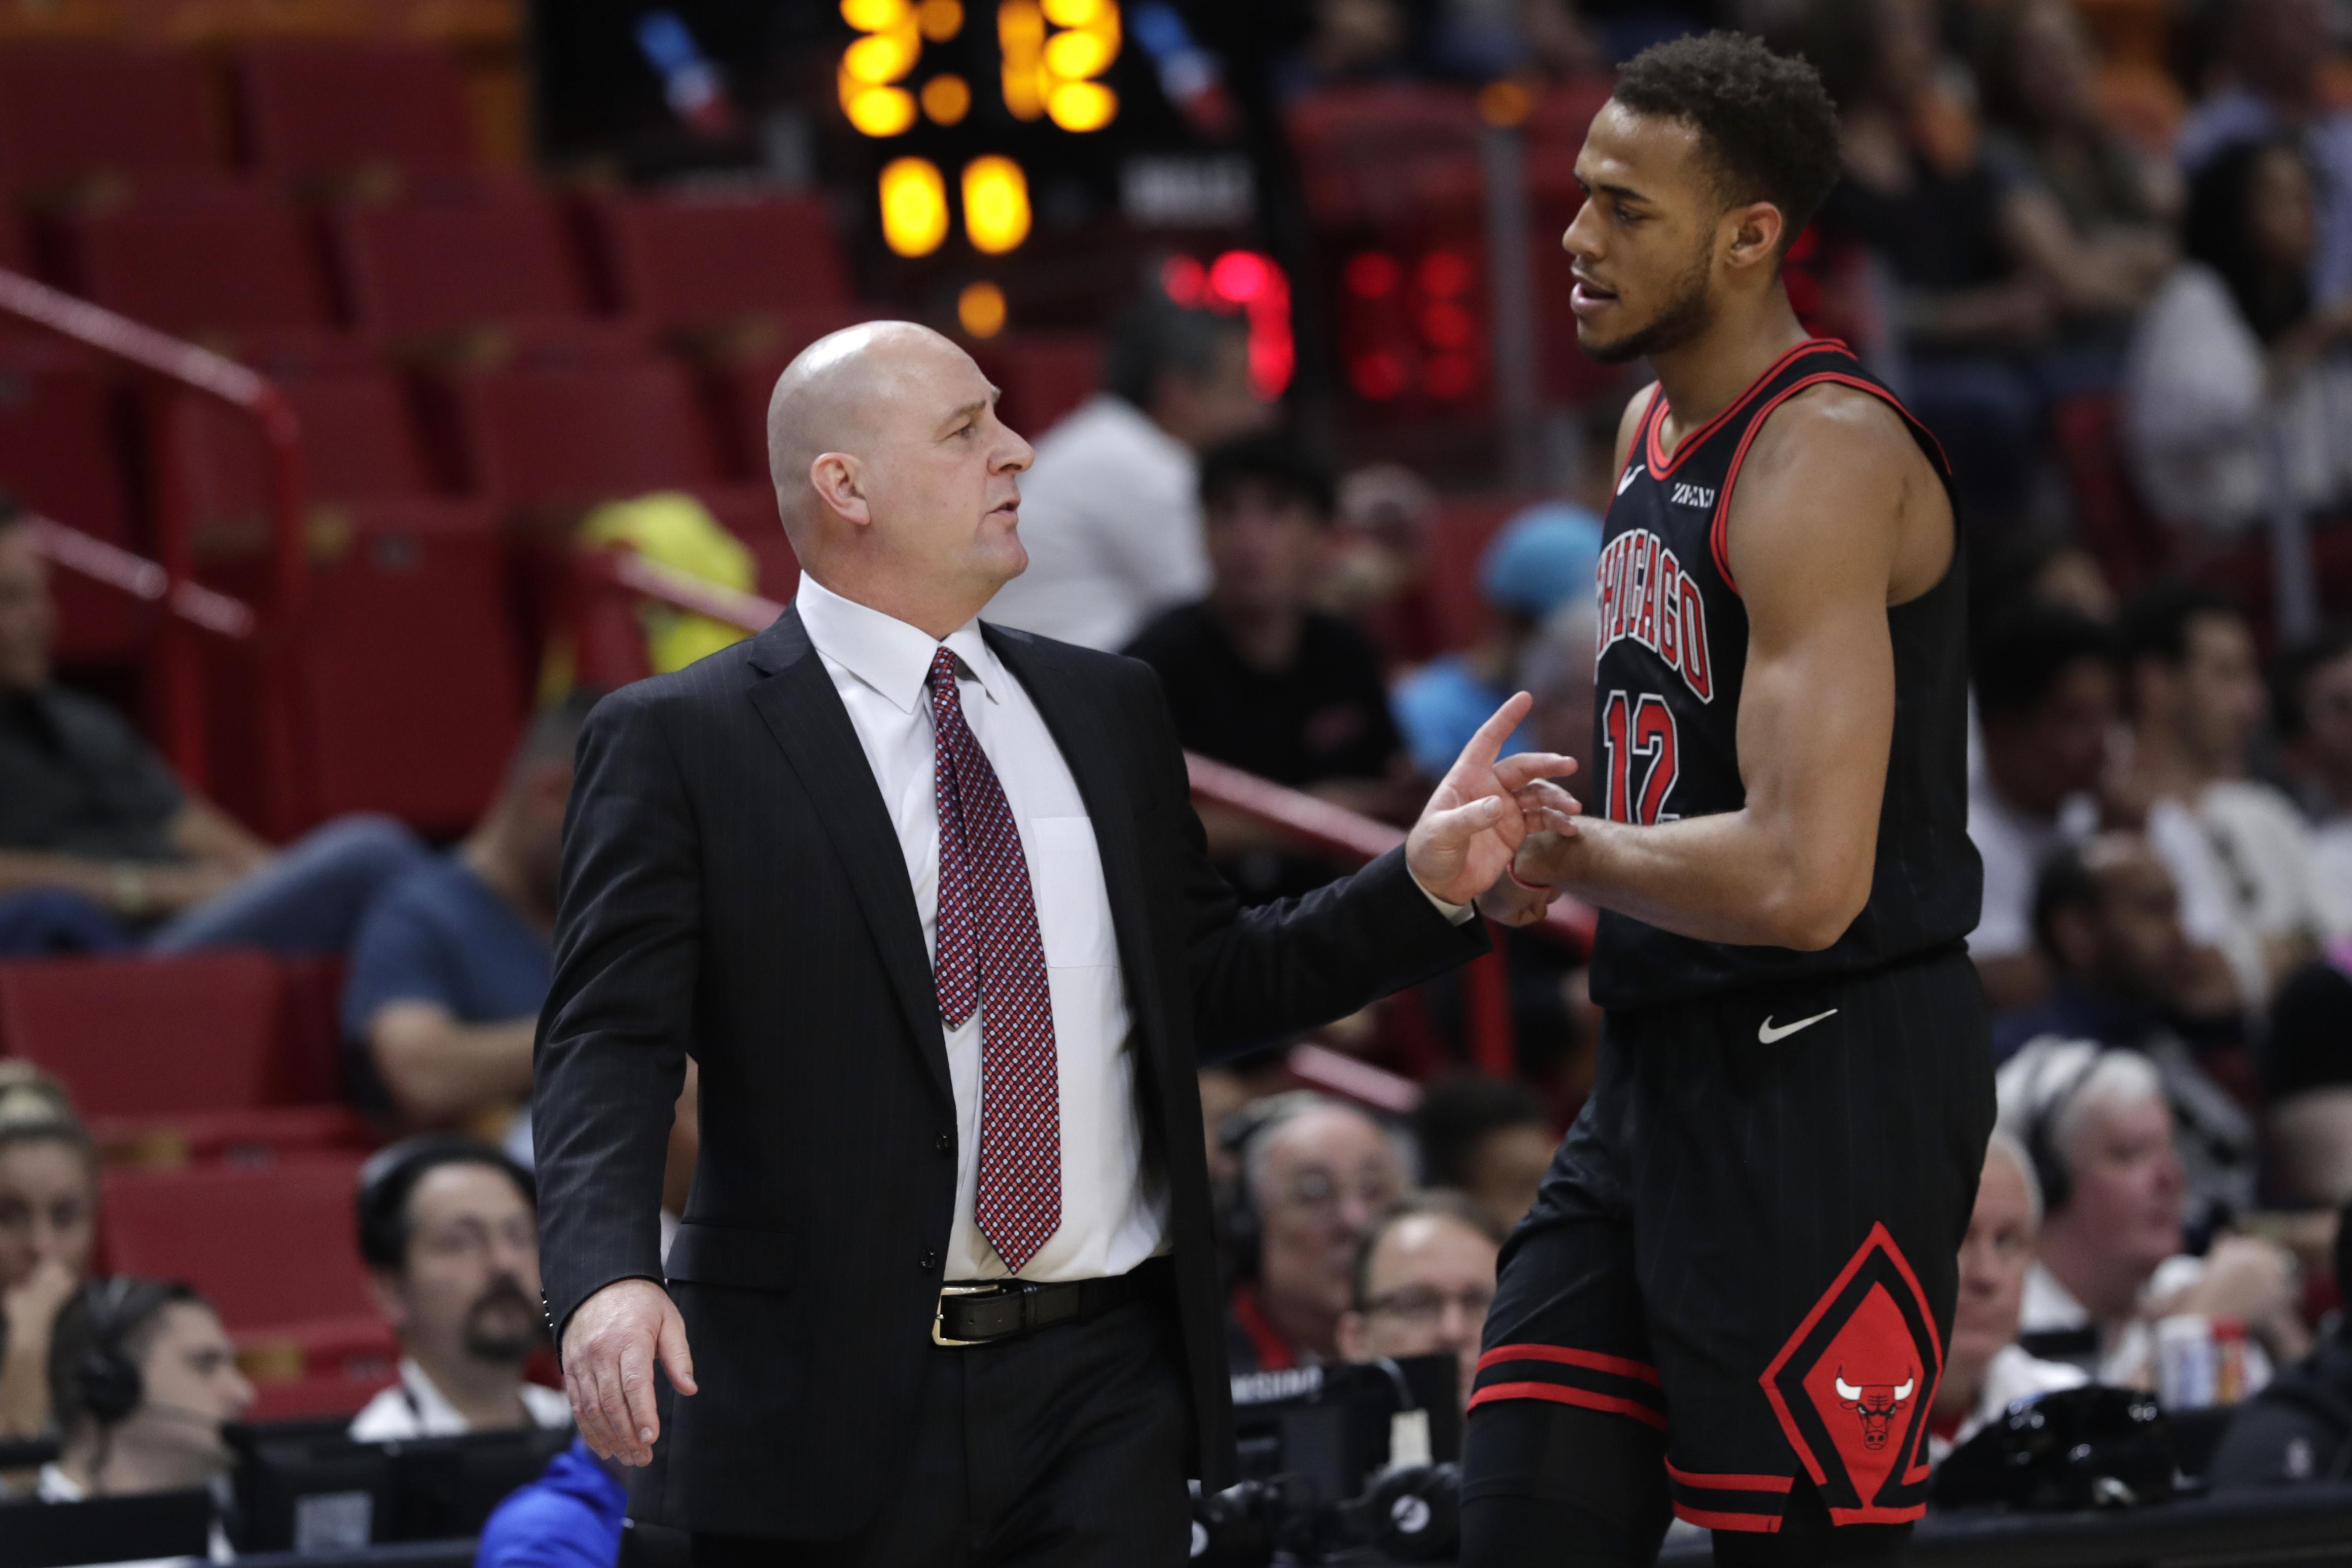 The Bulls' Daniel Gafford didn't exactly give coach Jim Boylen a ringing endorsement.